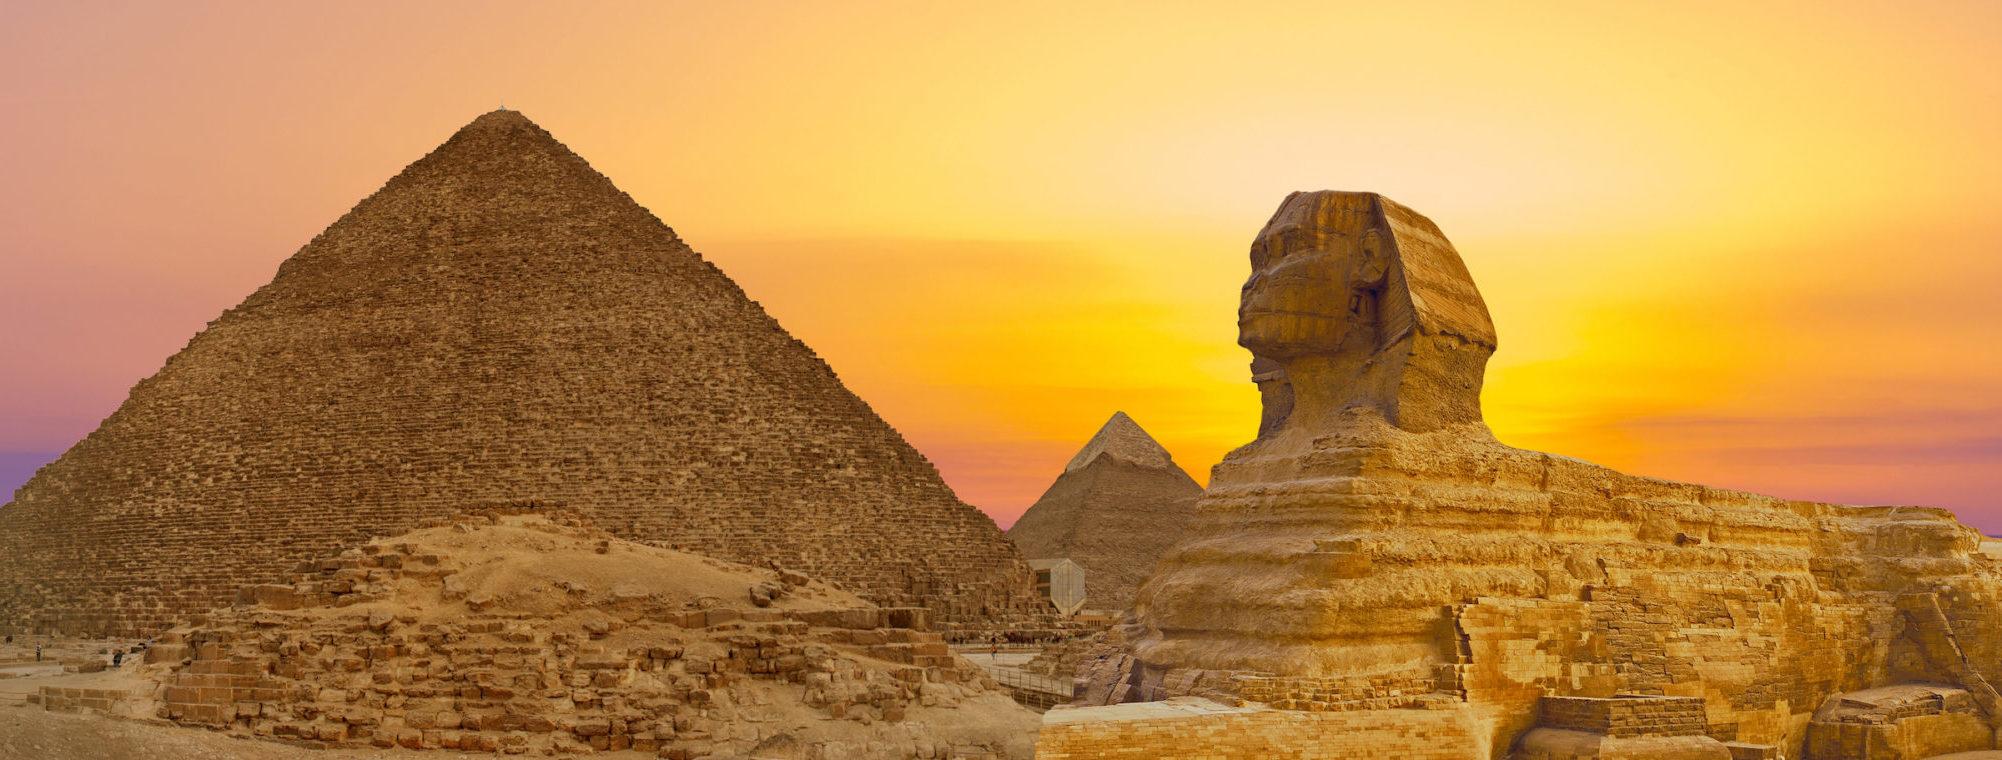 Egypt and Jordan Adventure from Adobe Stock